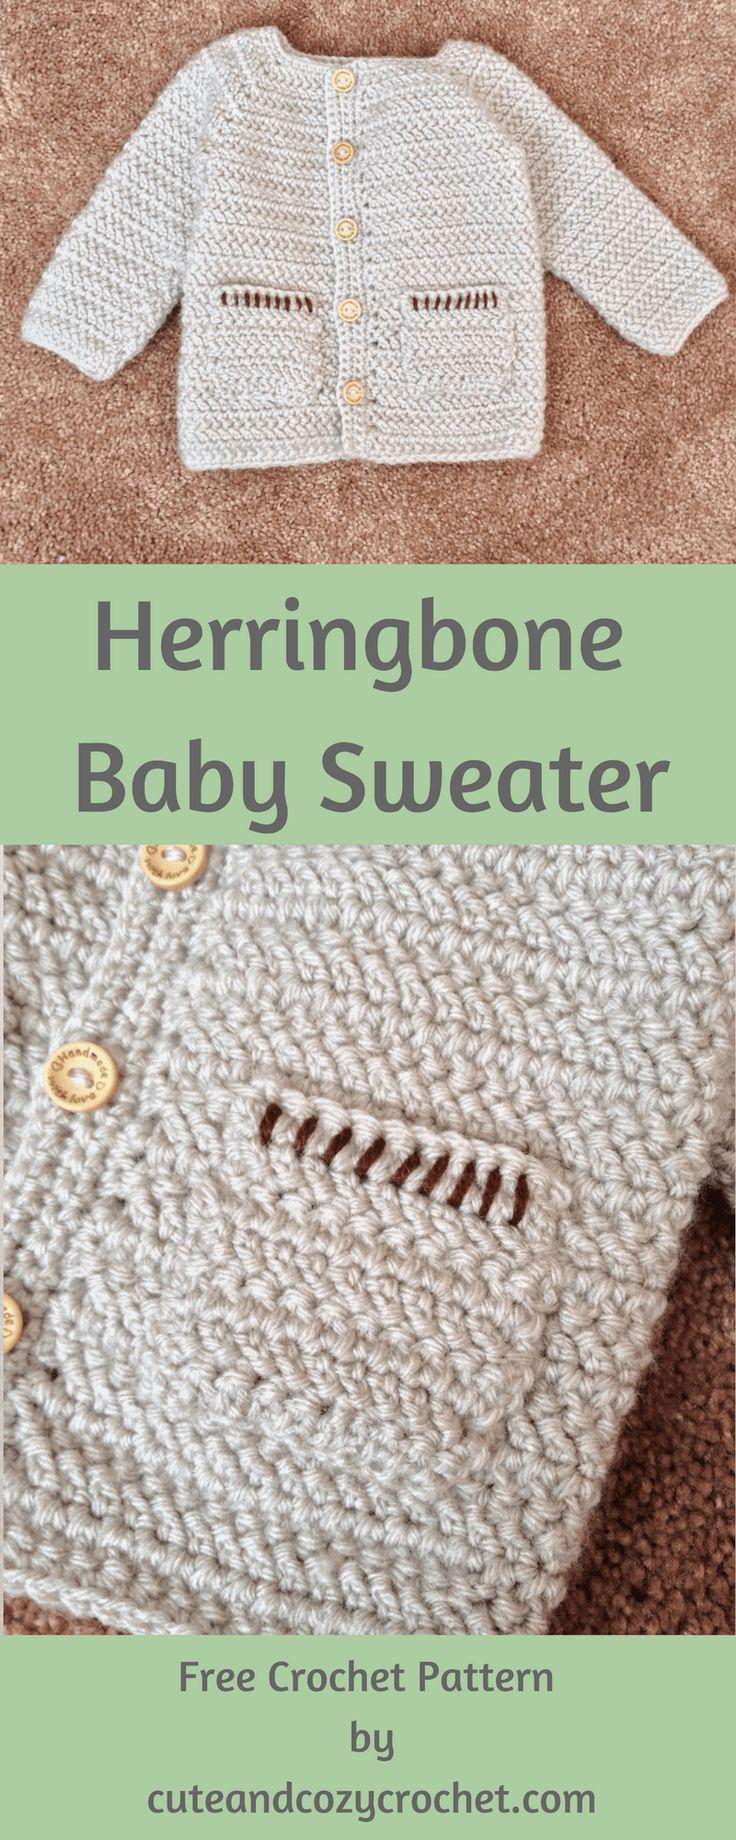 Herringbone Baby Sweater   Free Crochet Pattern   Baby Sweater   Double Crochet   Herringbone Double Crochet   Baby Pockets   Wooden Buttons   Baby Shower   Baby Gift   Crochet